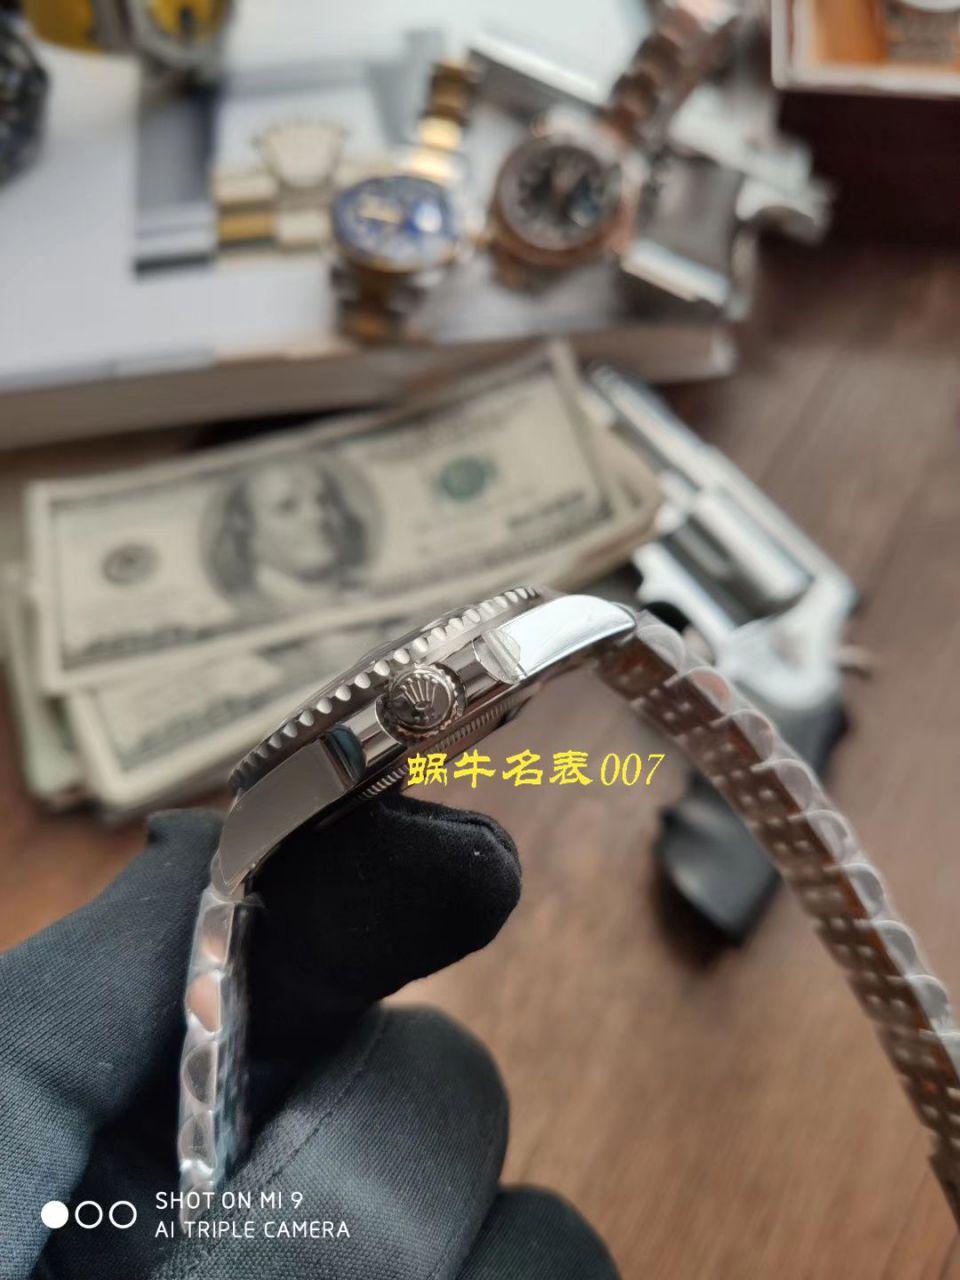 【NOOB厂Rolex顶级复刻手表】劳力士格林尼治型II系列126710BLRO-0001腕表 / R378